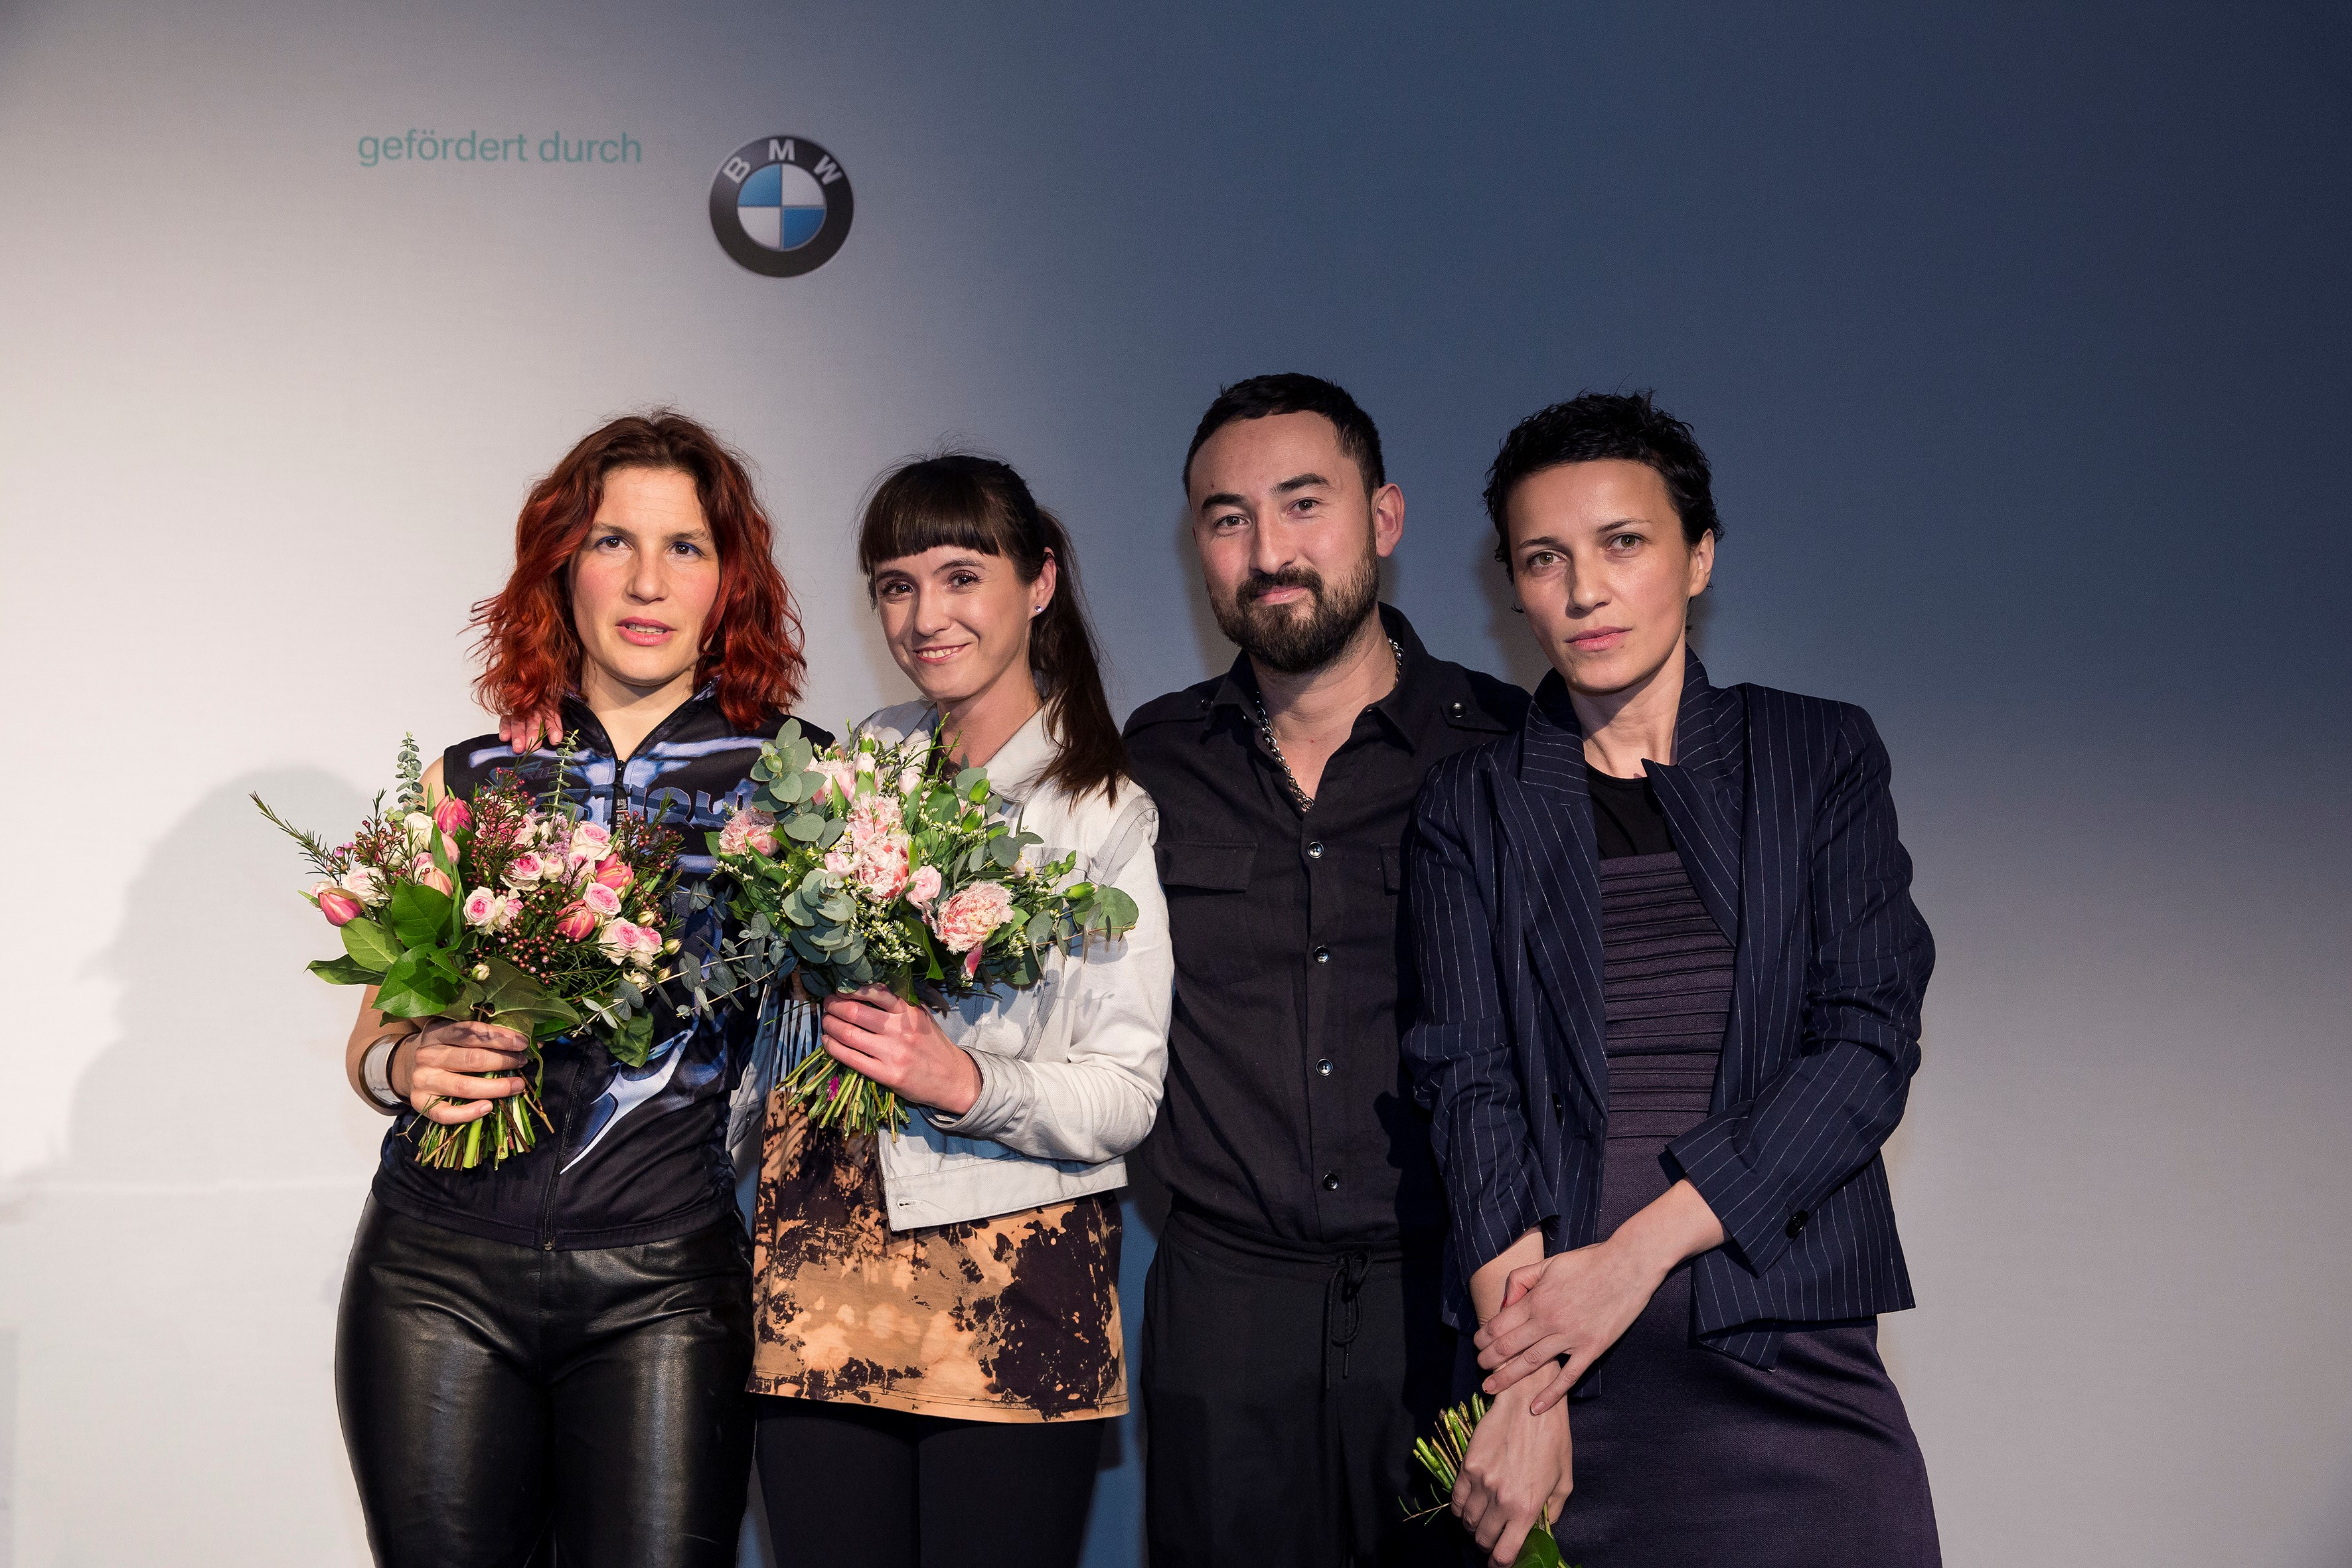 Preis der Nationalgalerie, Prestigious German Art Award, Names 2019 Nominees